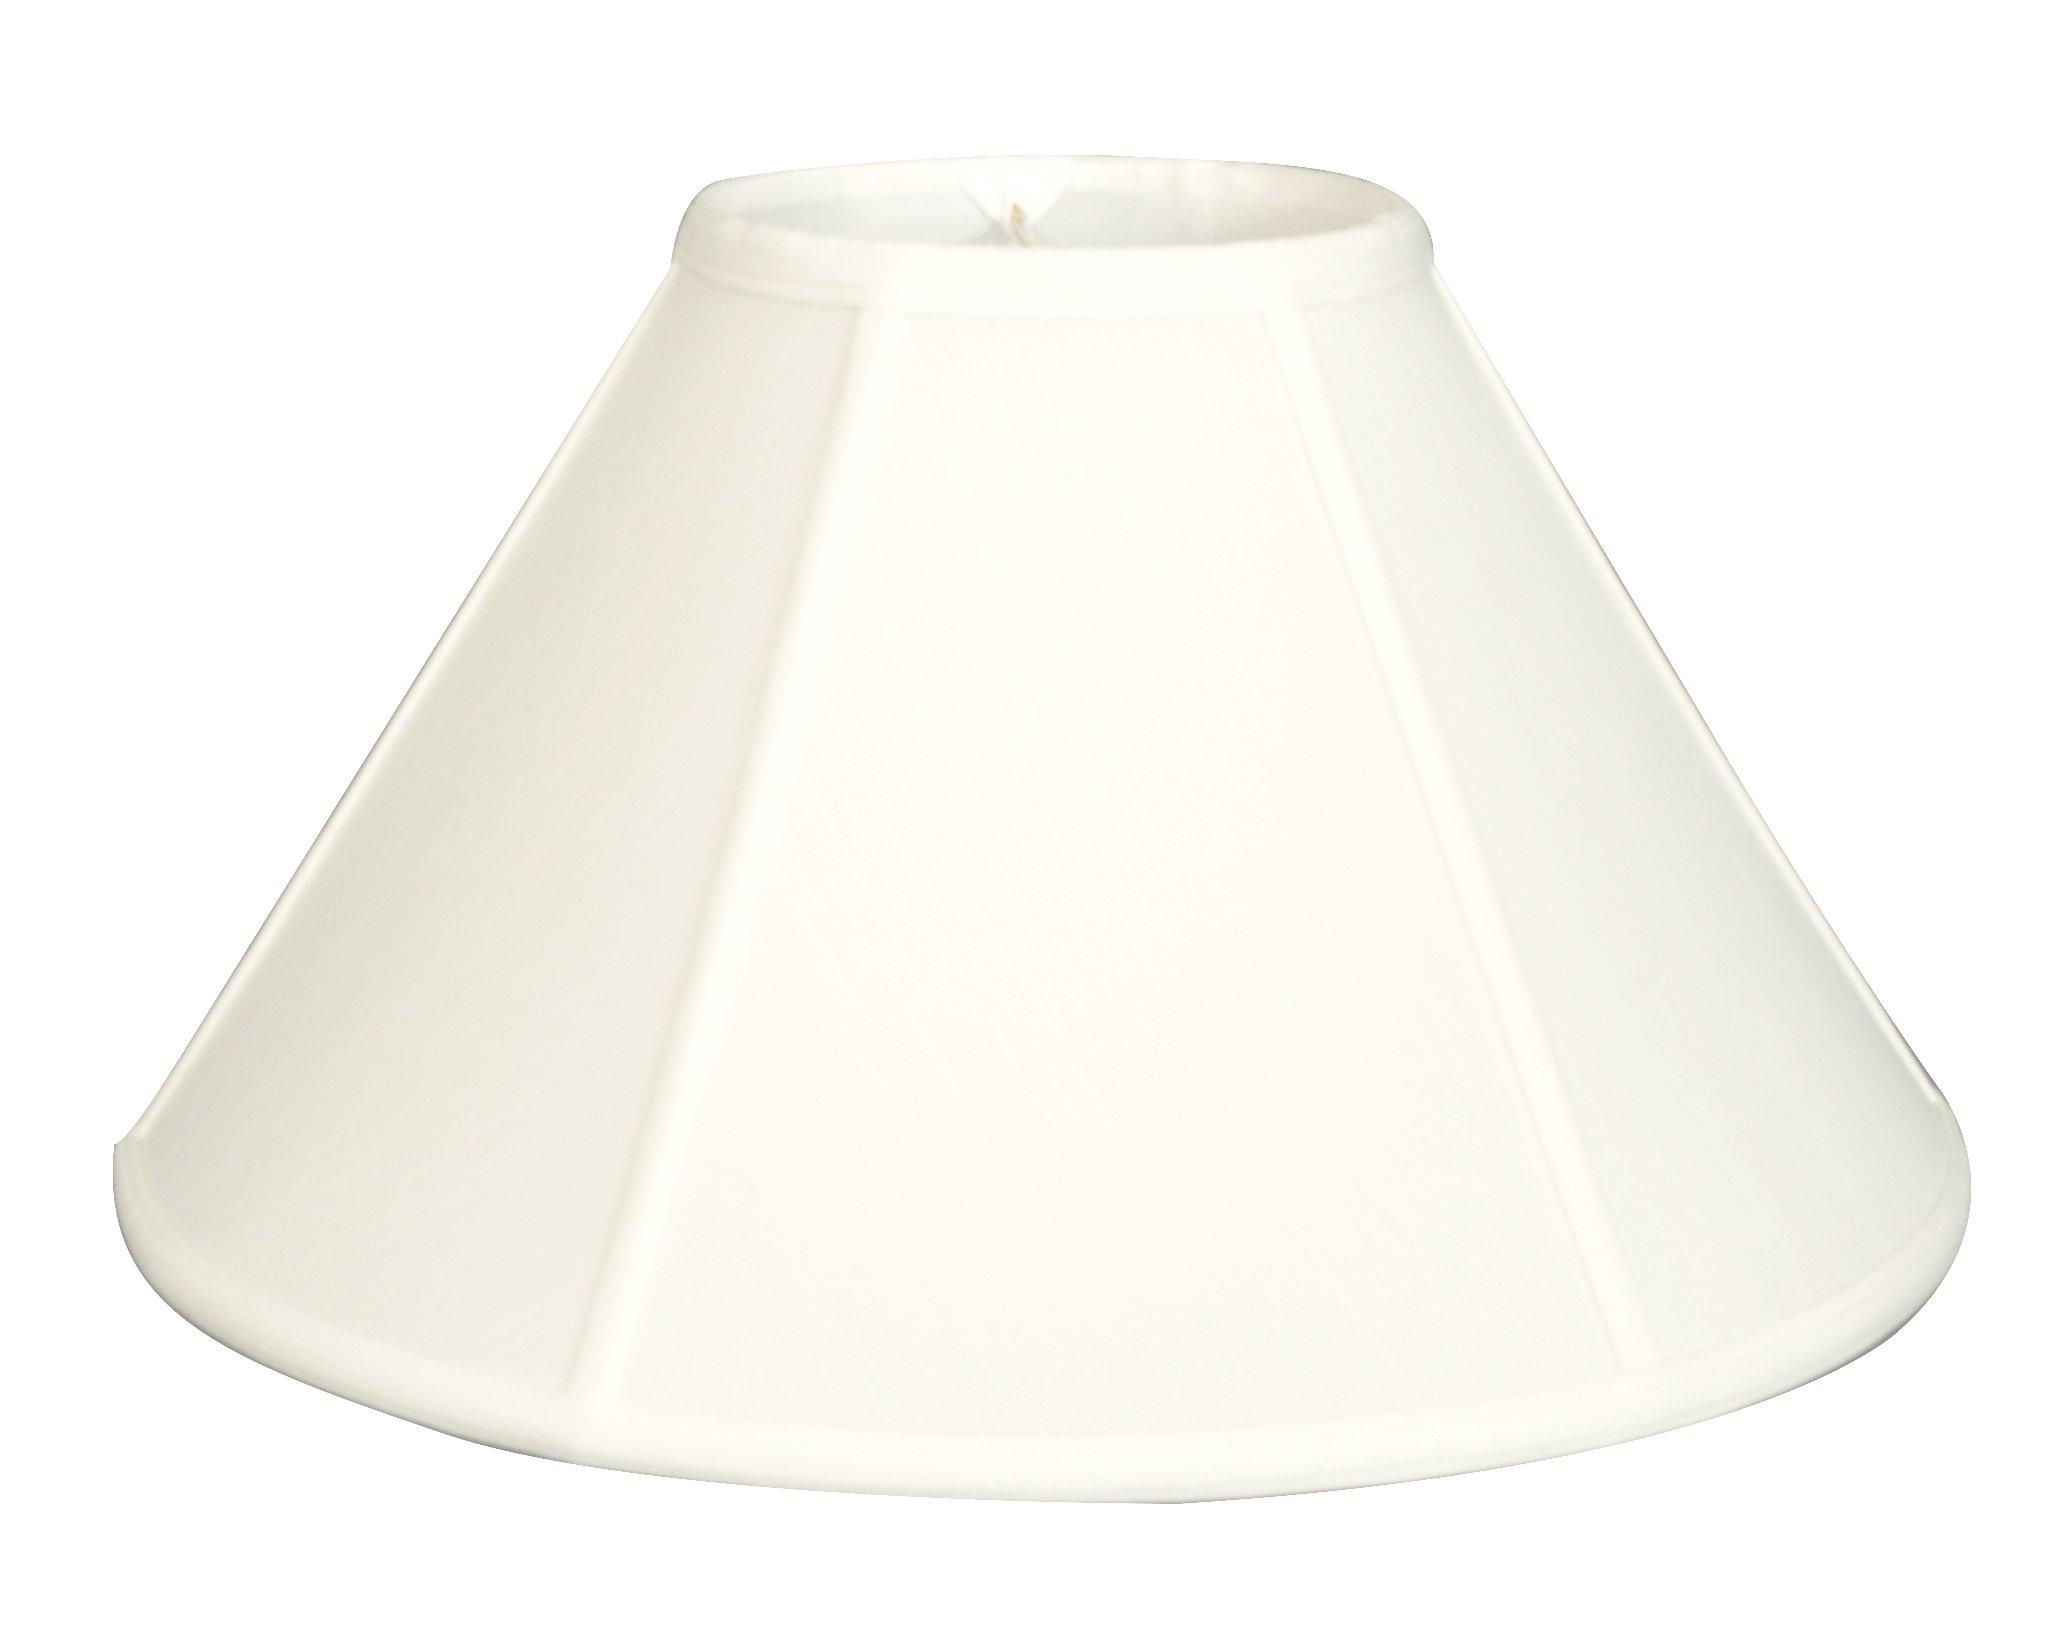 Royal Designs Empire Wall Lamp Shade - White - 5 x 13 x 8